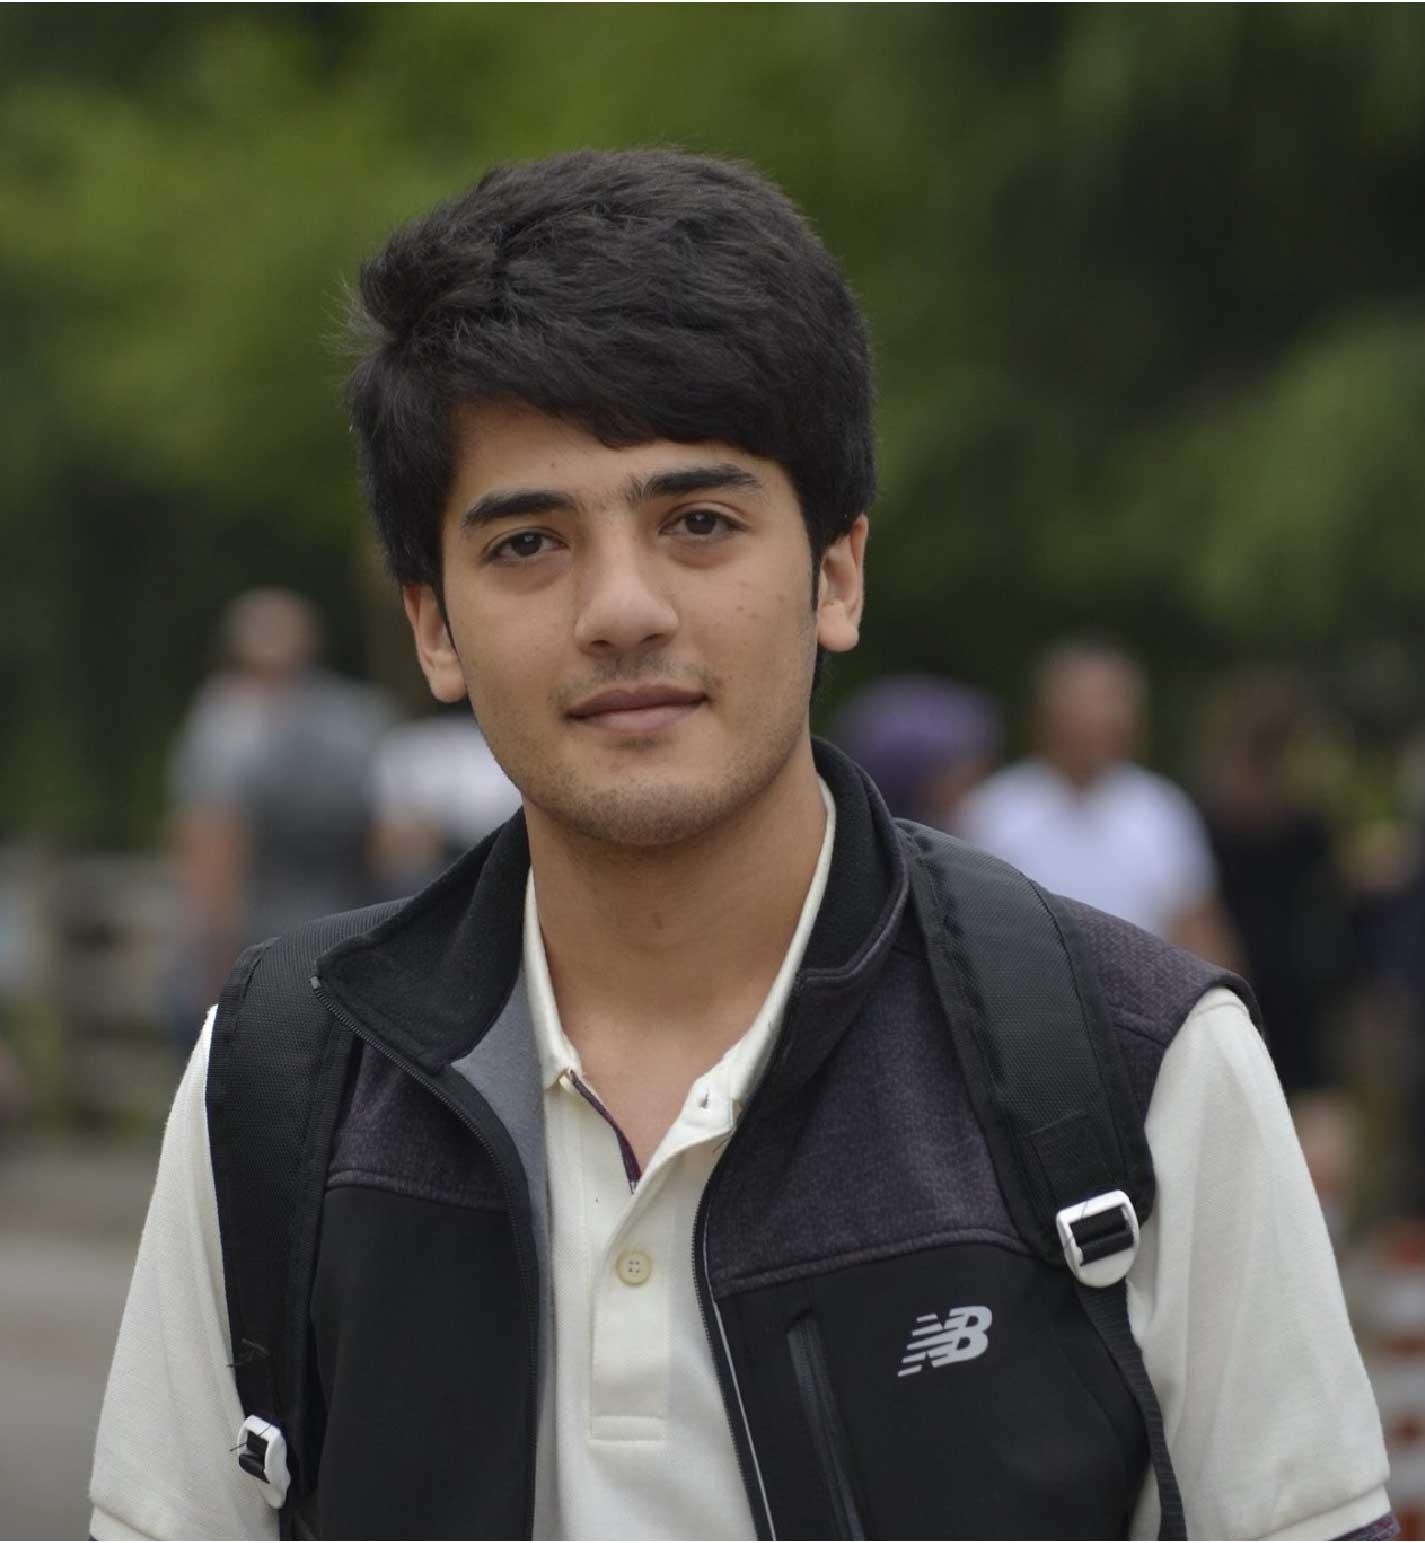 AbdAlrahman Alnajjar